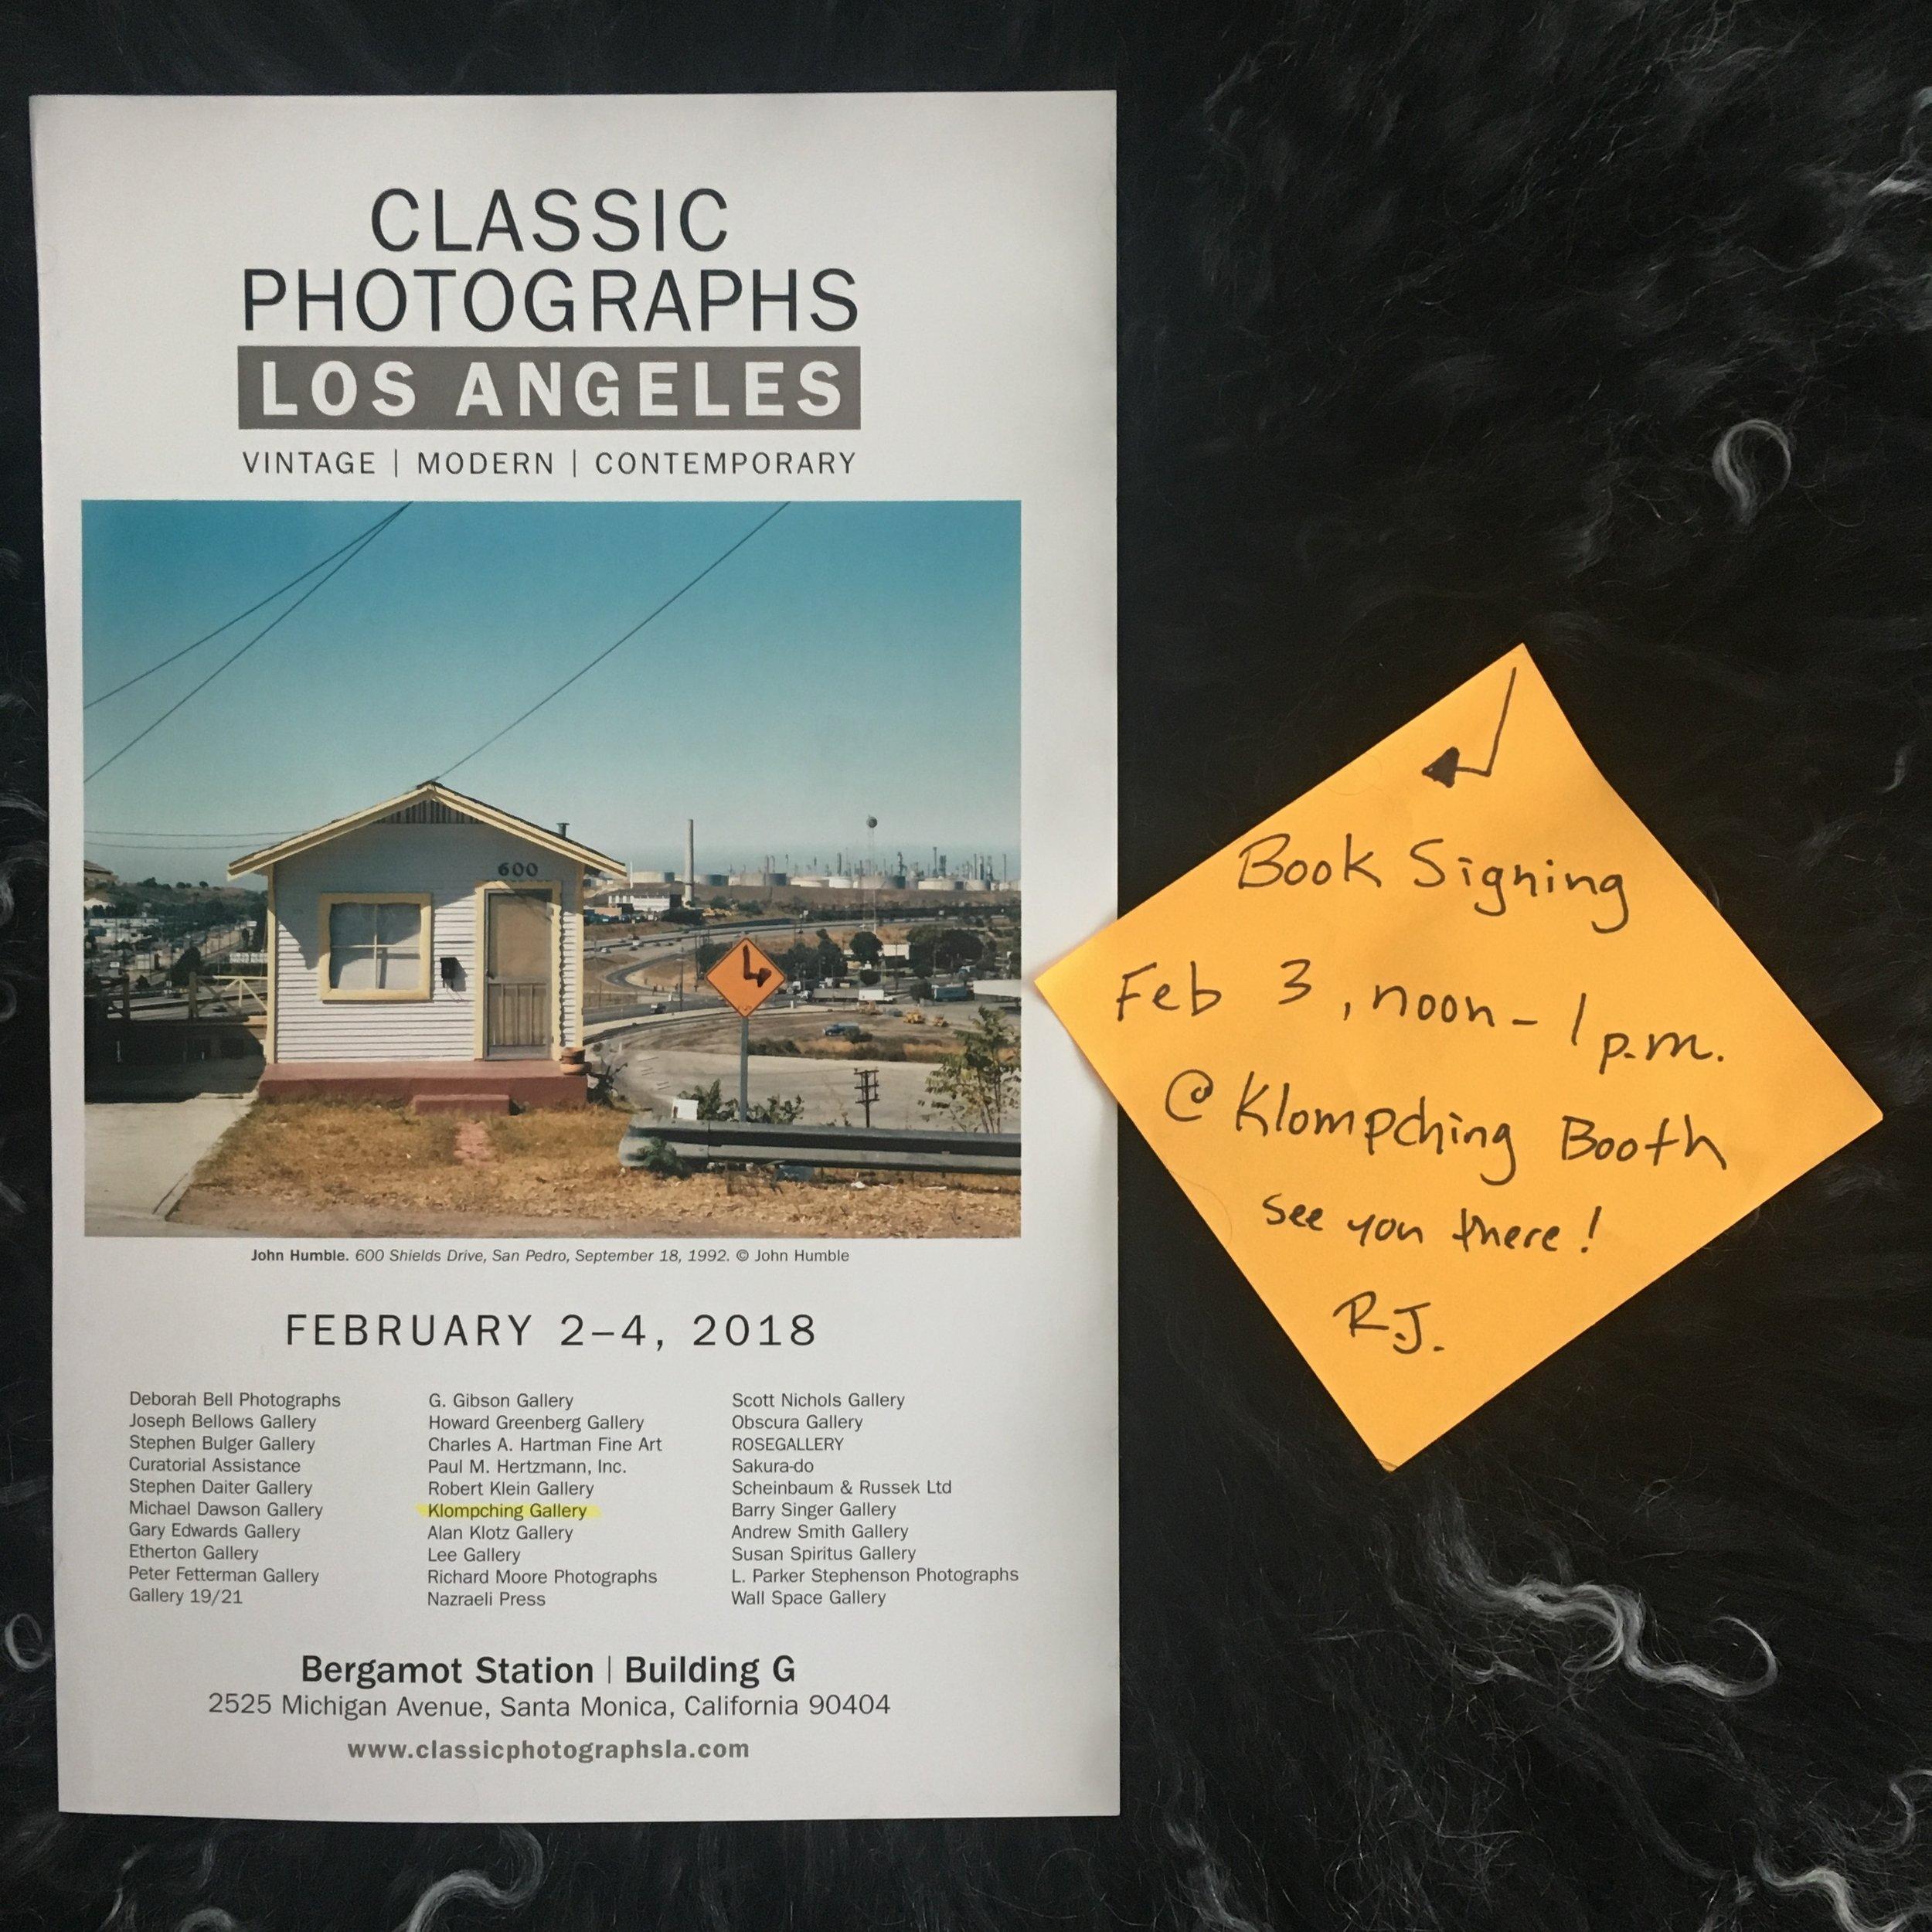 Classic-Photographs-LA-RJ-Kern-book-signing-Klompching-Gallery-2018.JPG